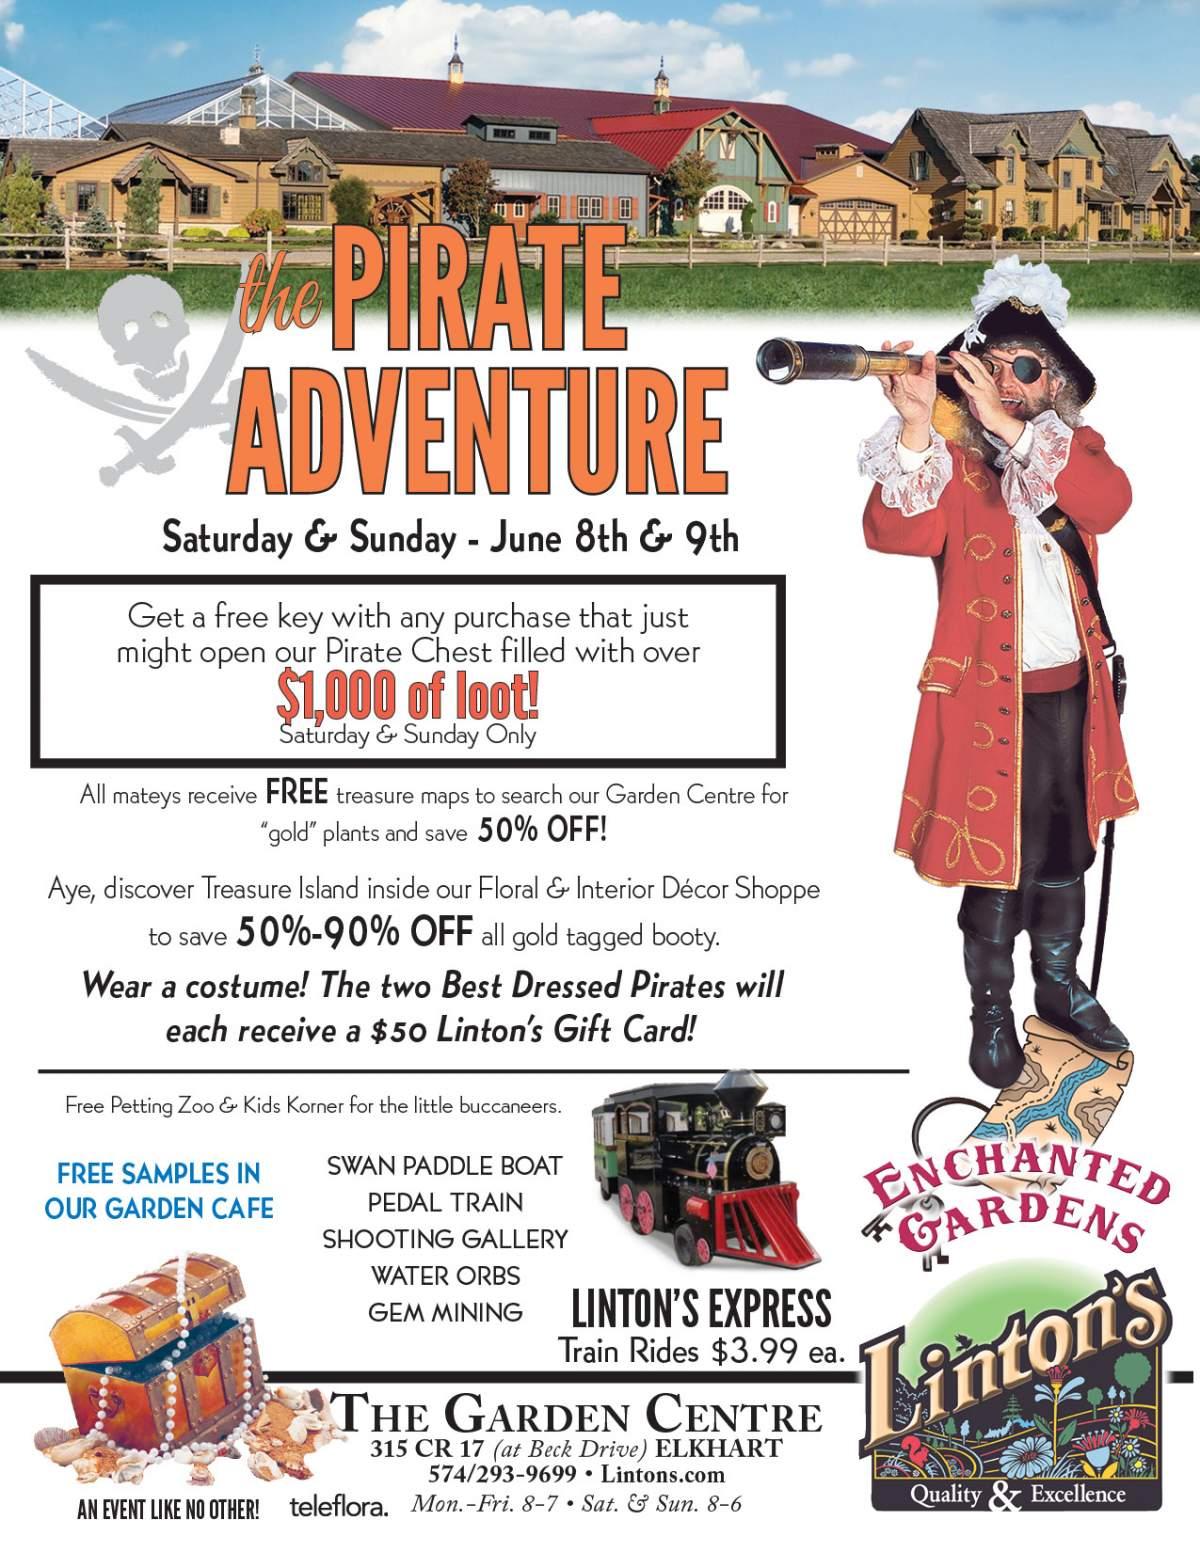 Linton's Enchanted Gardens : Pirate%20Adventure%20Flyer